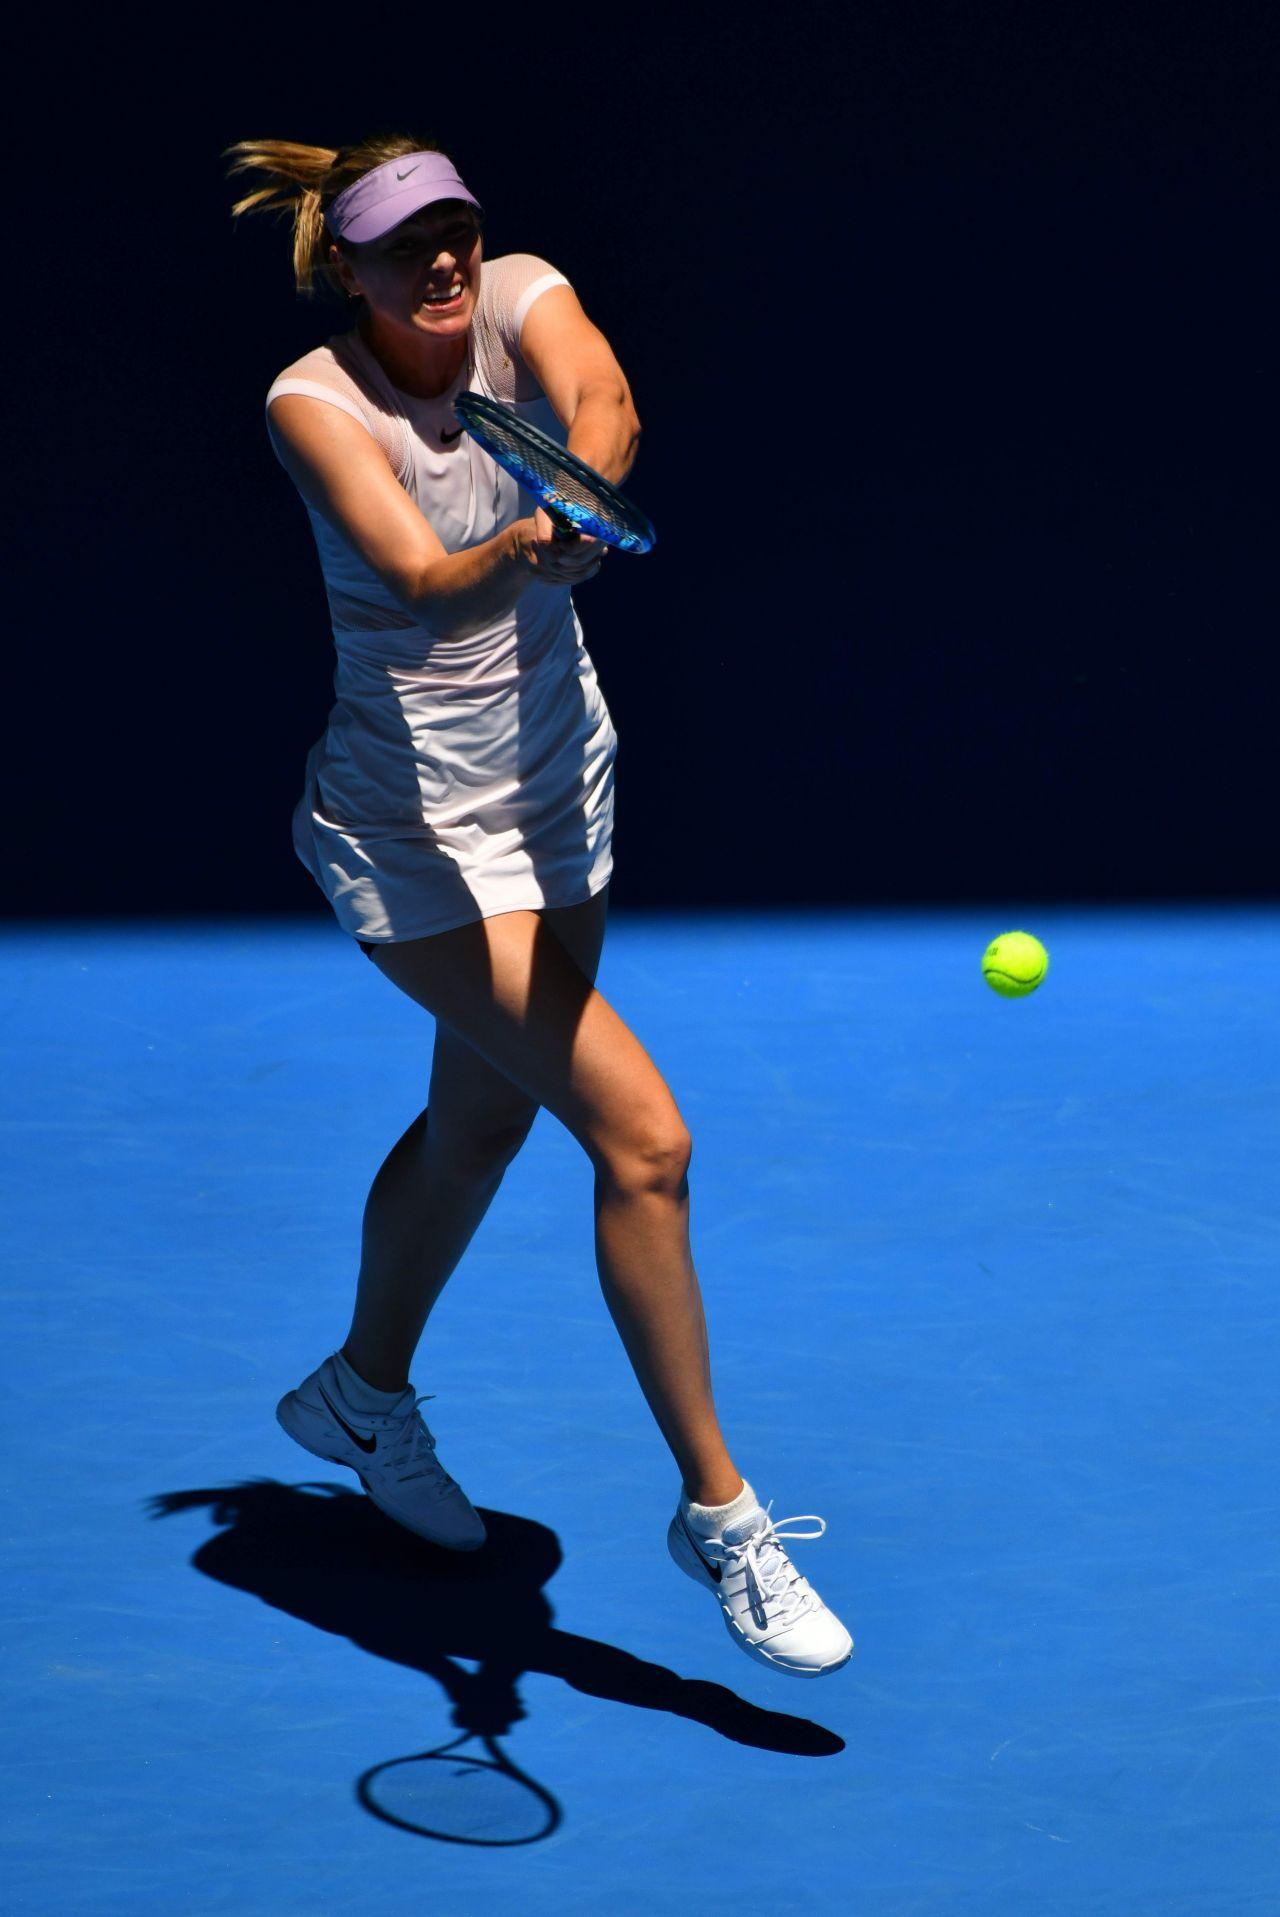 Maria Sharapova Australian Open 01 16 2018